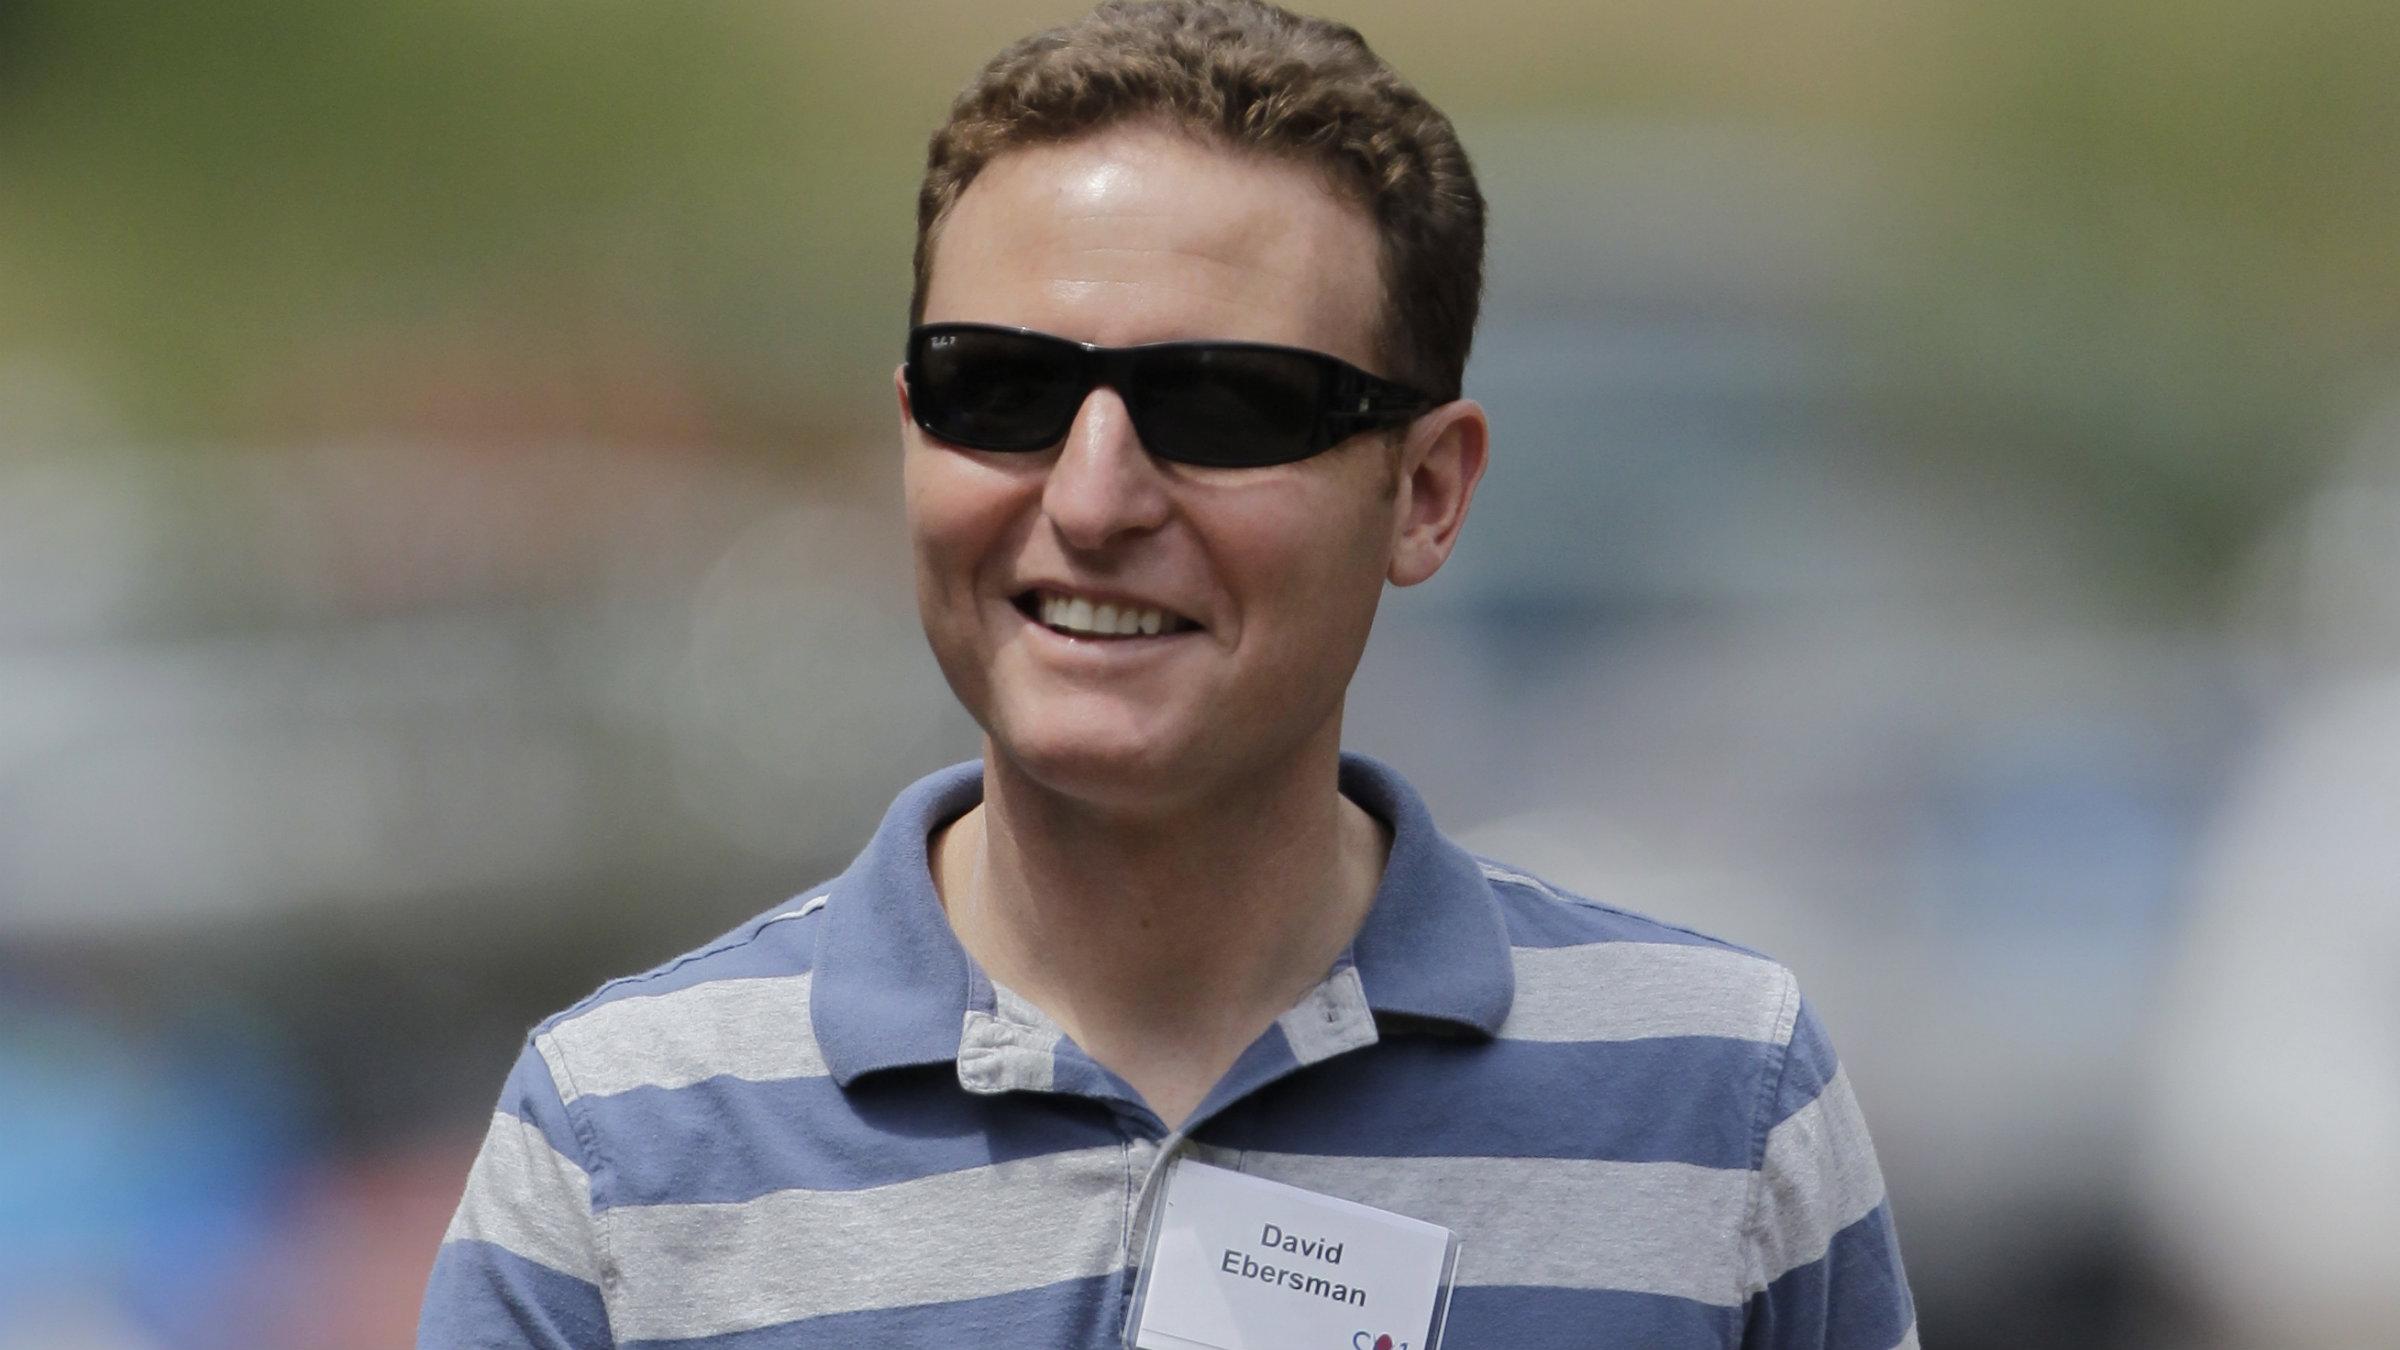 Facebook CFO David Ebersman